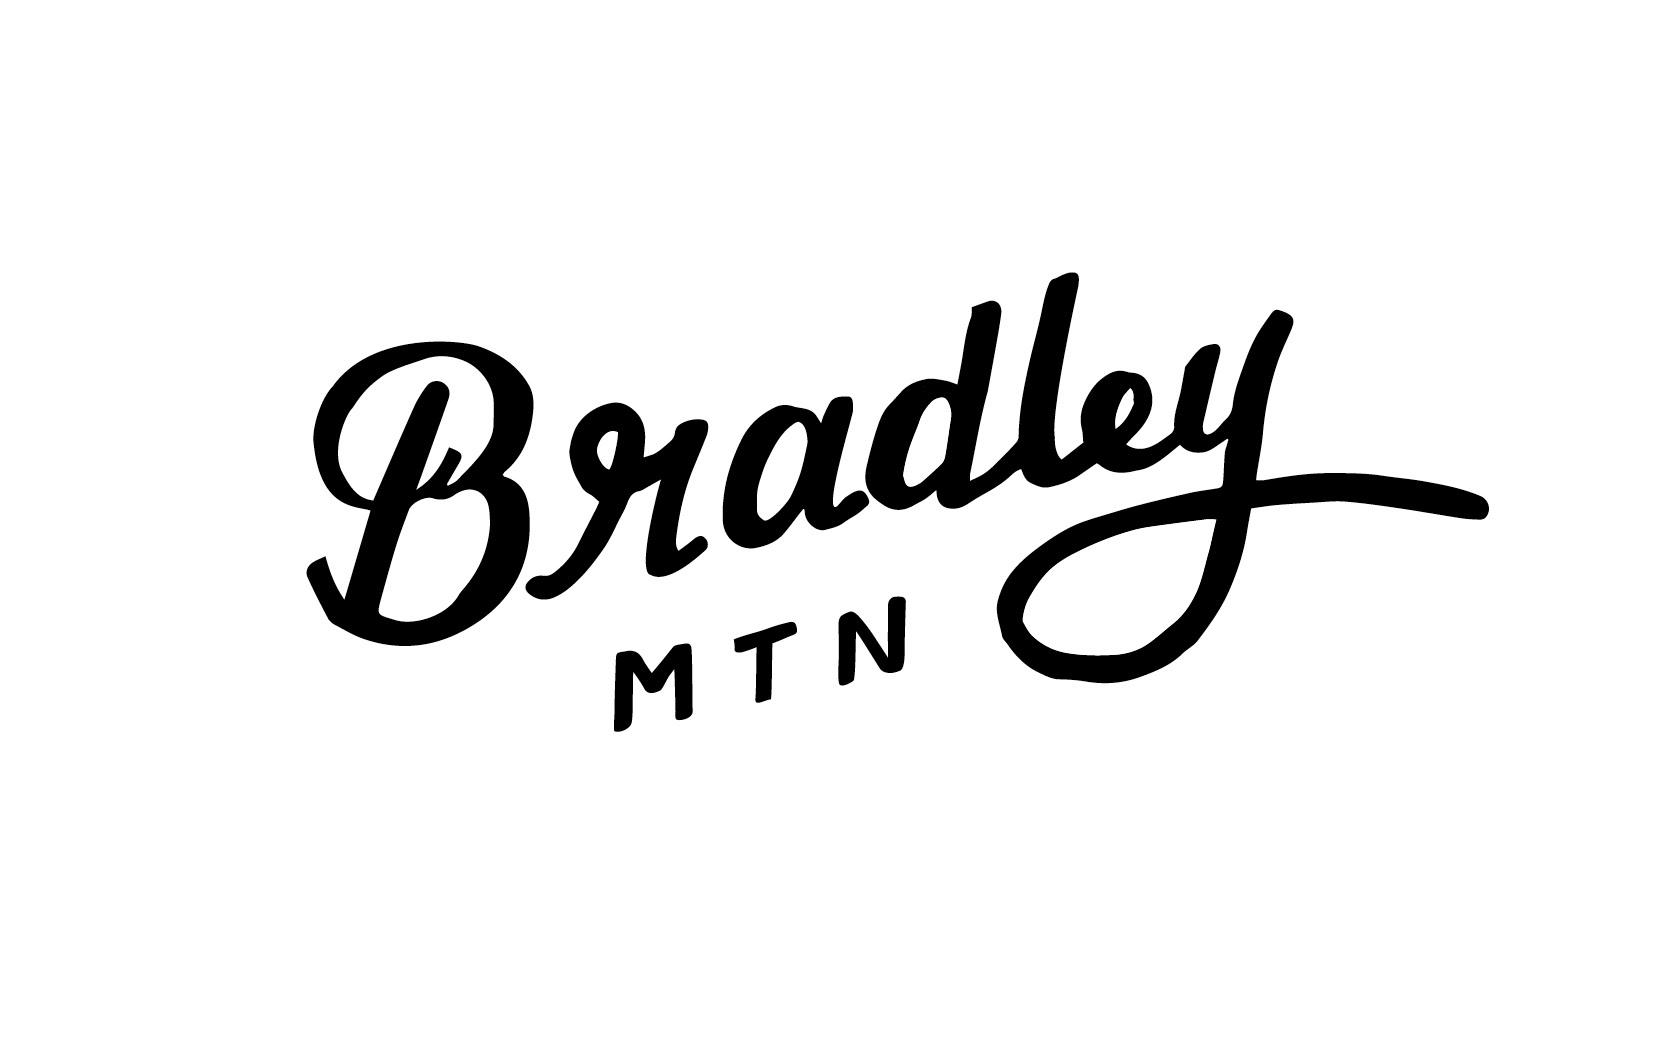 bradley_mountain_portfolio.jpg